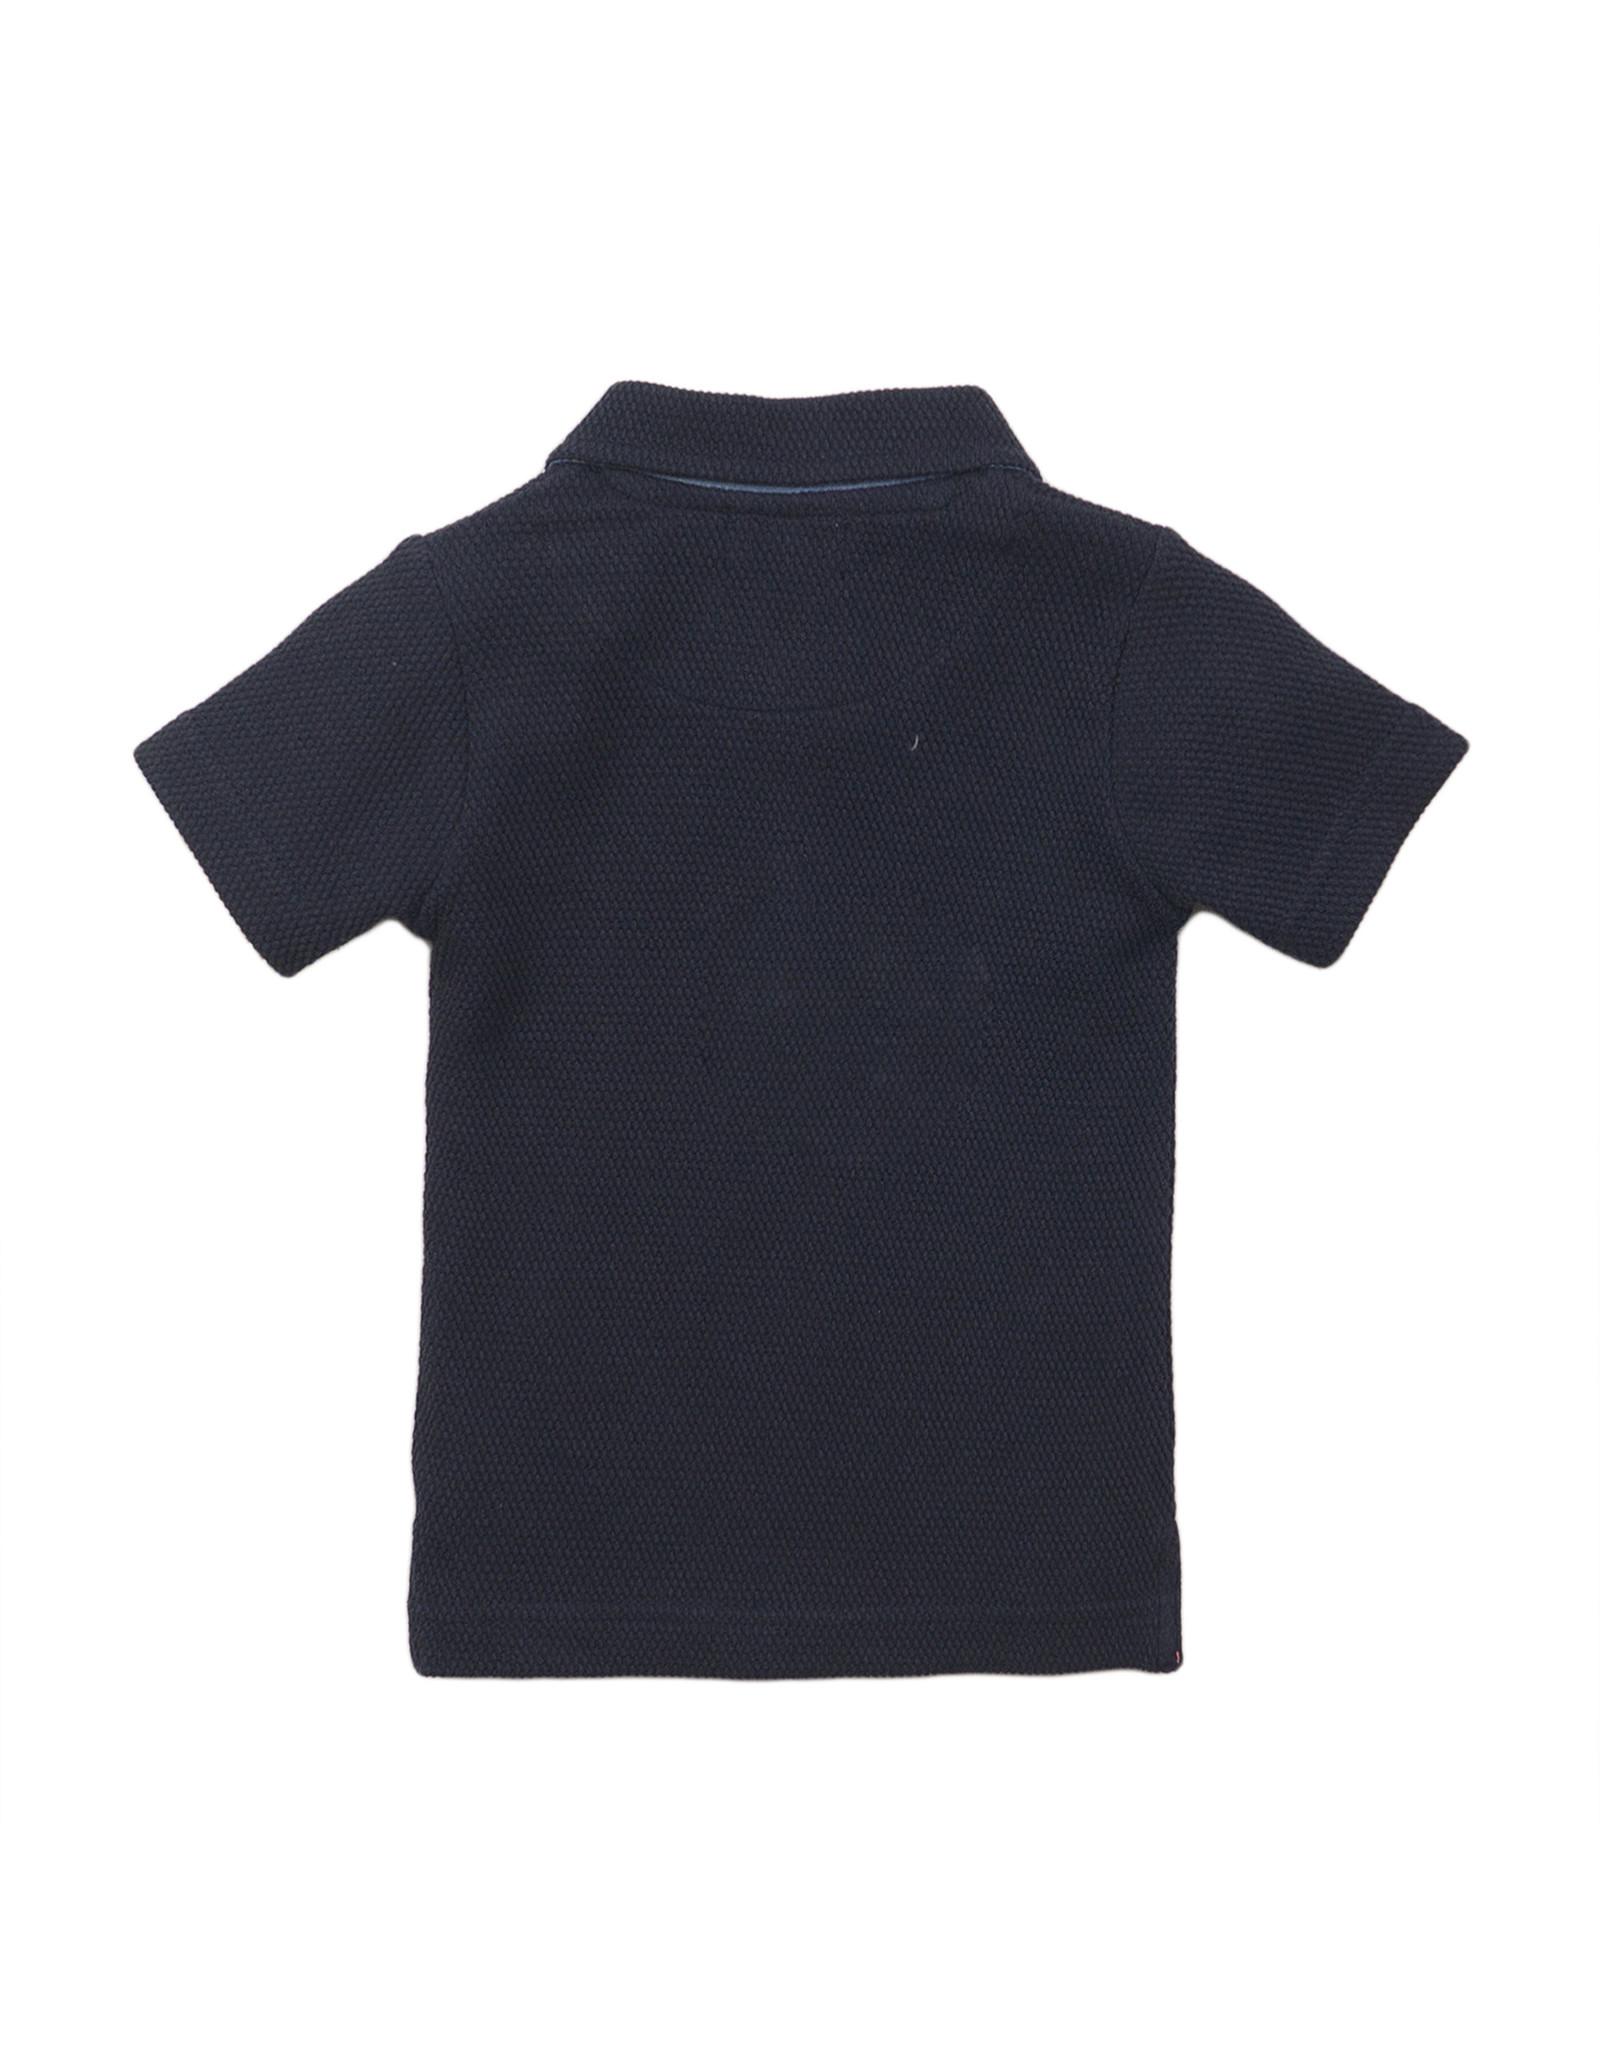 Dirkje Dirkje baby jongens polo t-shirt met 2 borstzakjes Navy